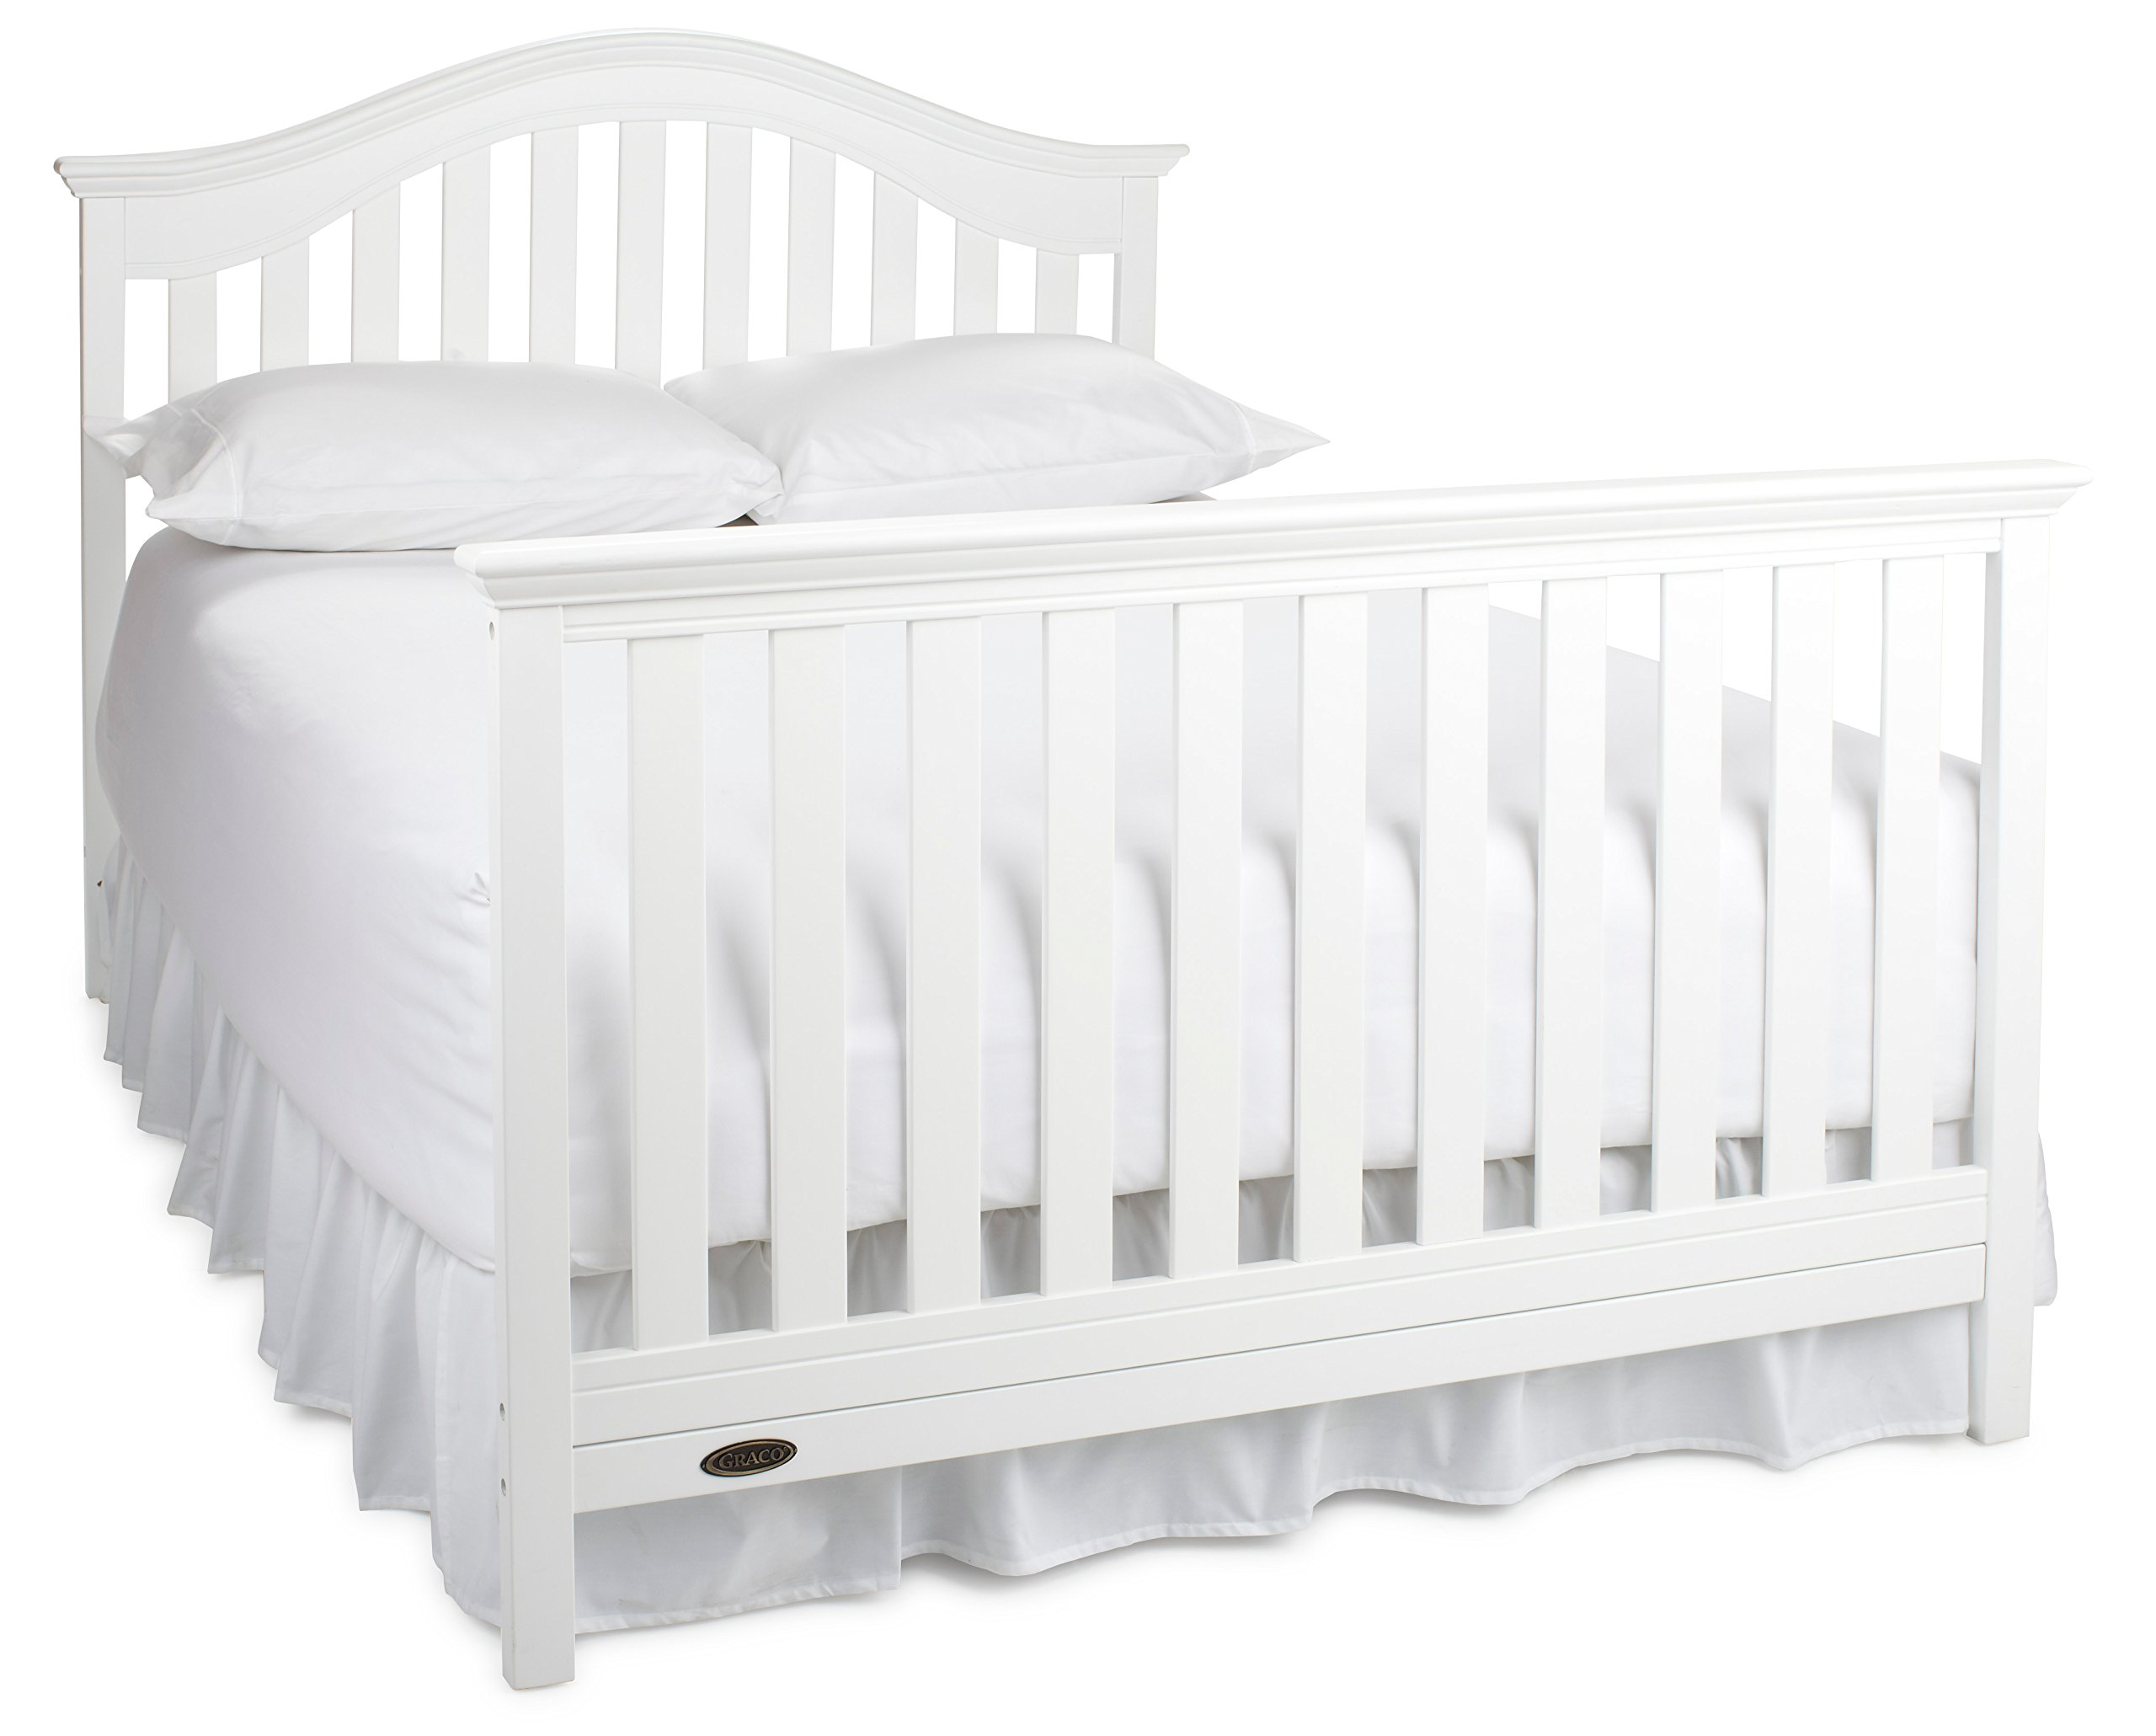 Graco Bryson 4-in-1 Convertible Crib, White, Easily ...